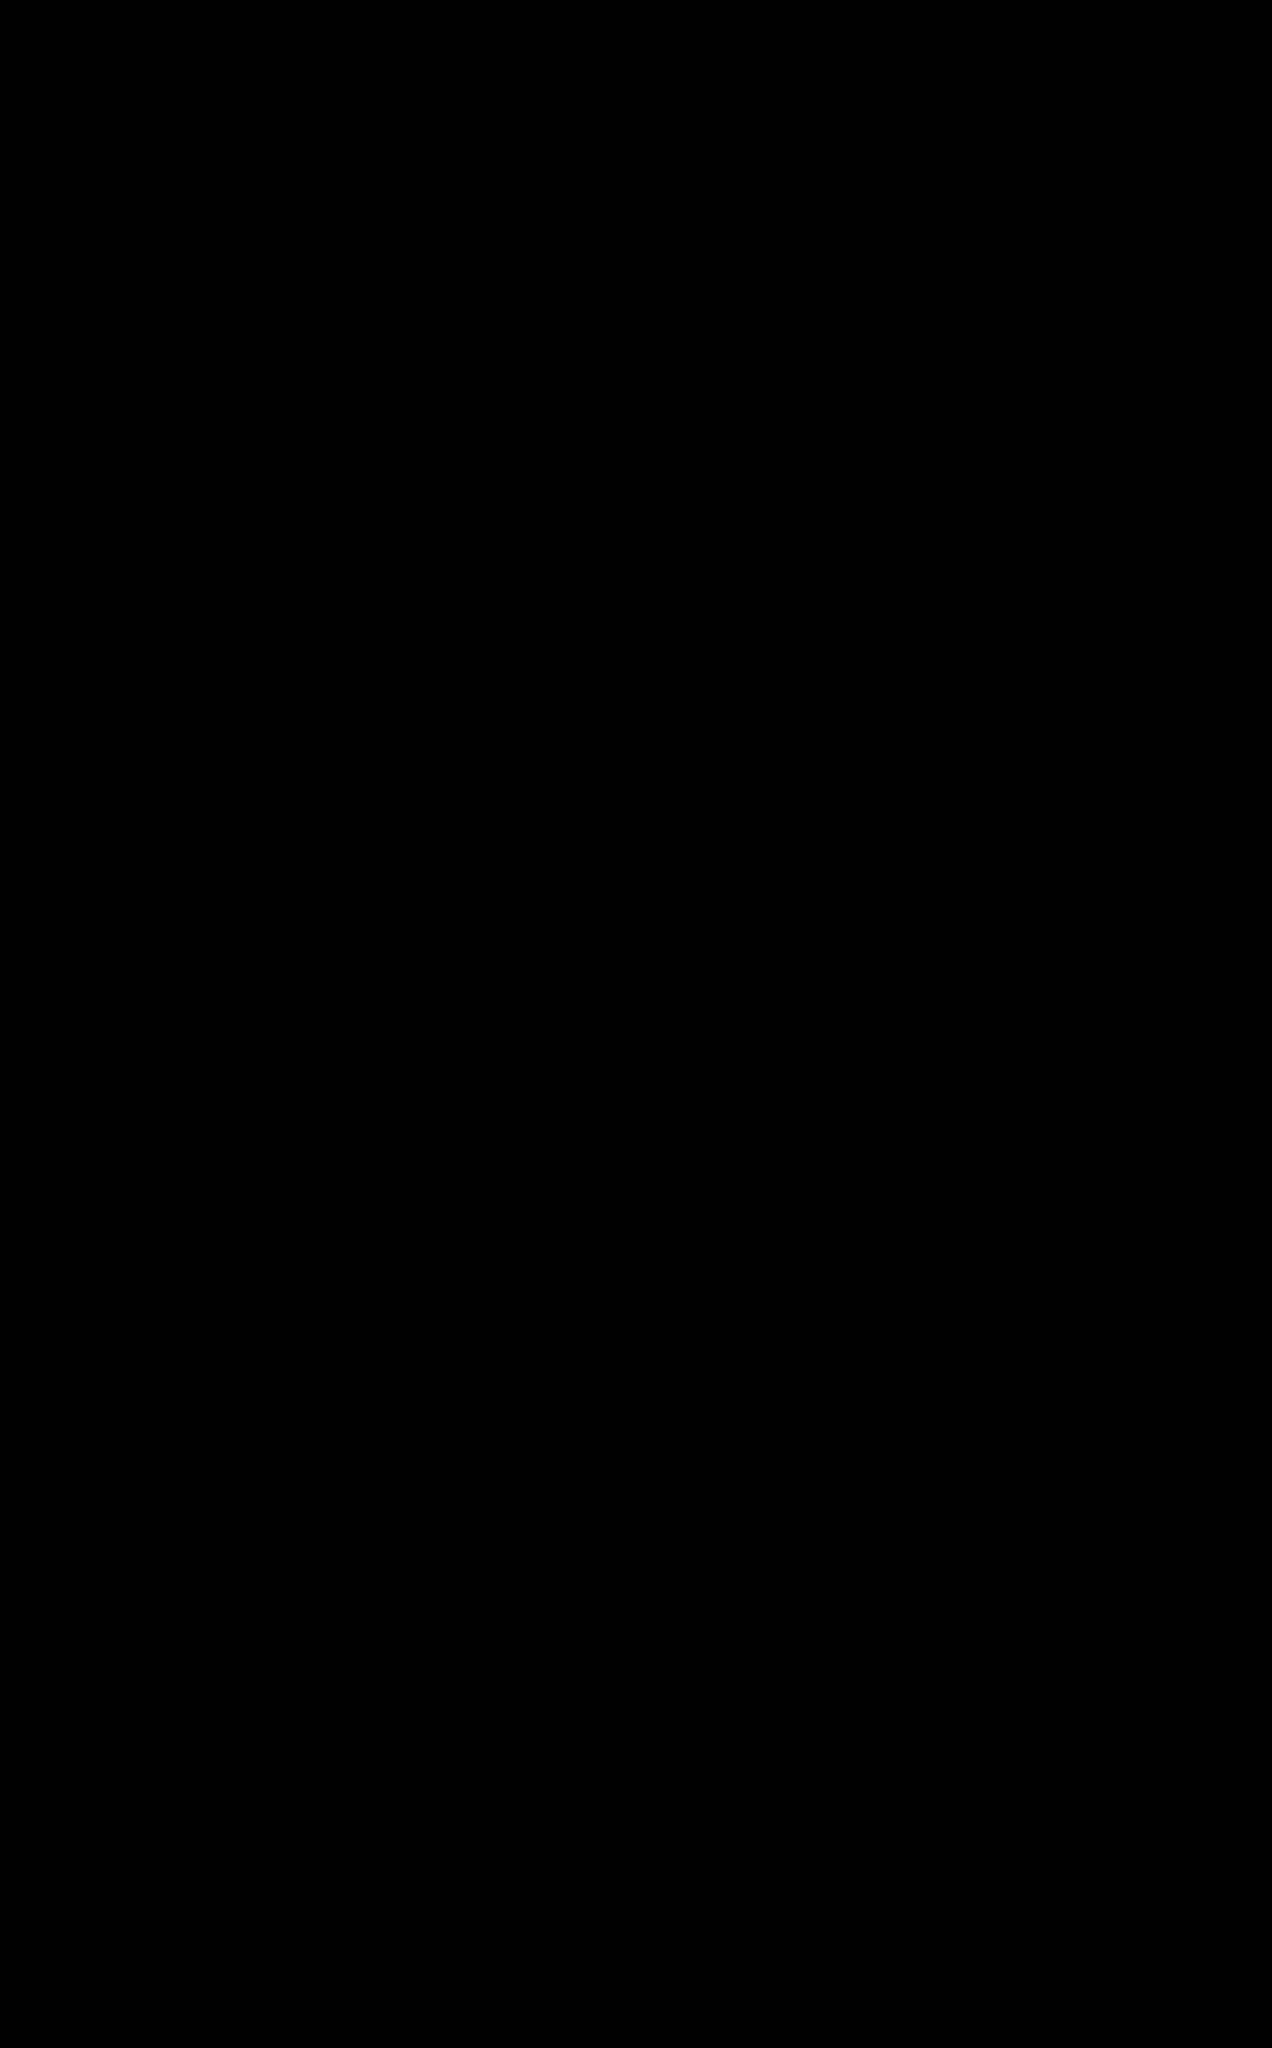 Deism symbol tee deist. Flames clipart black and white